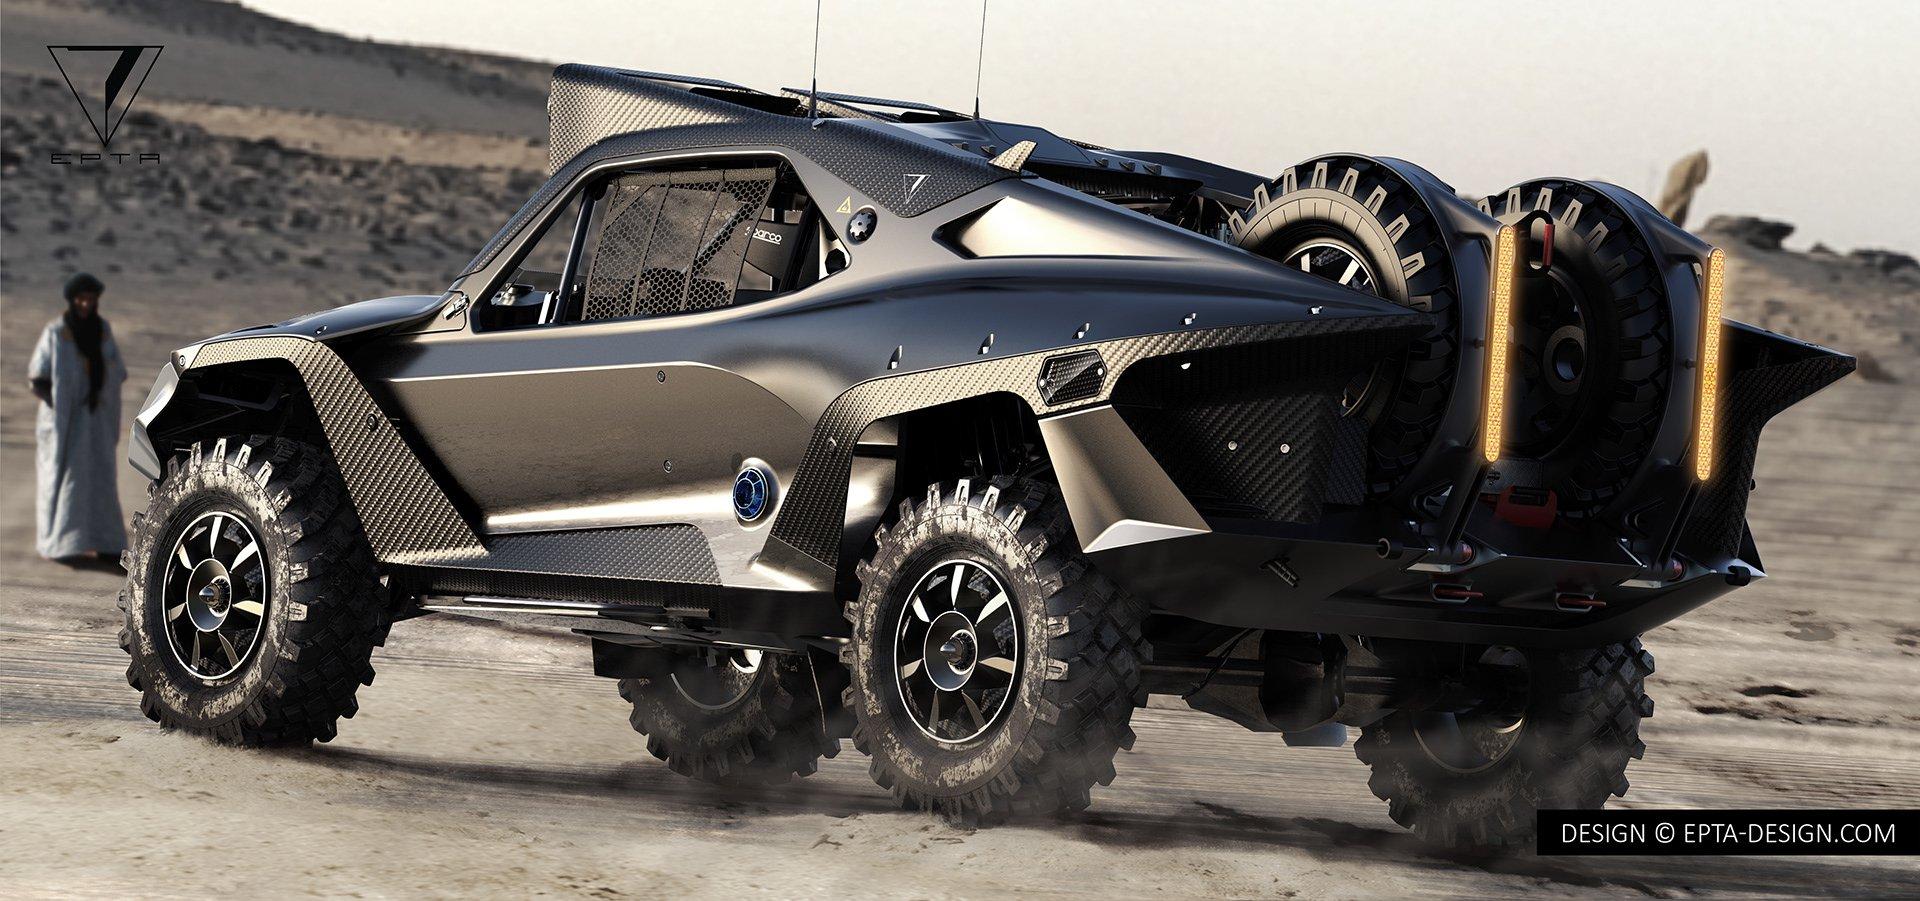 Desert Storm Trophy Truck by EPTA Design (2)